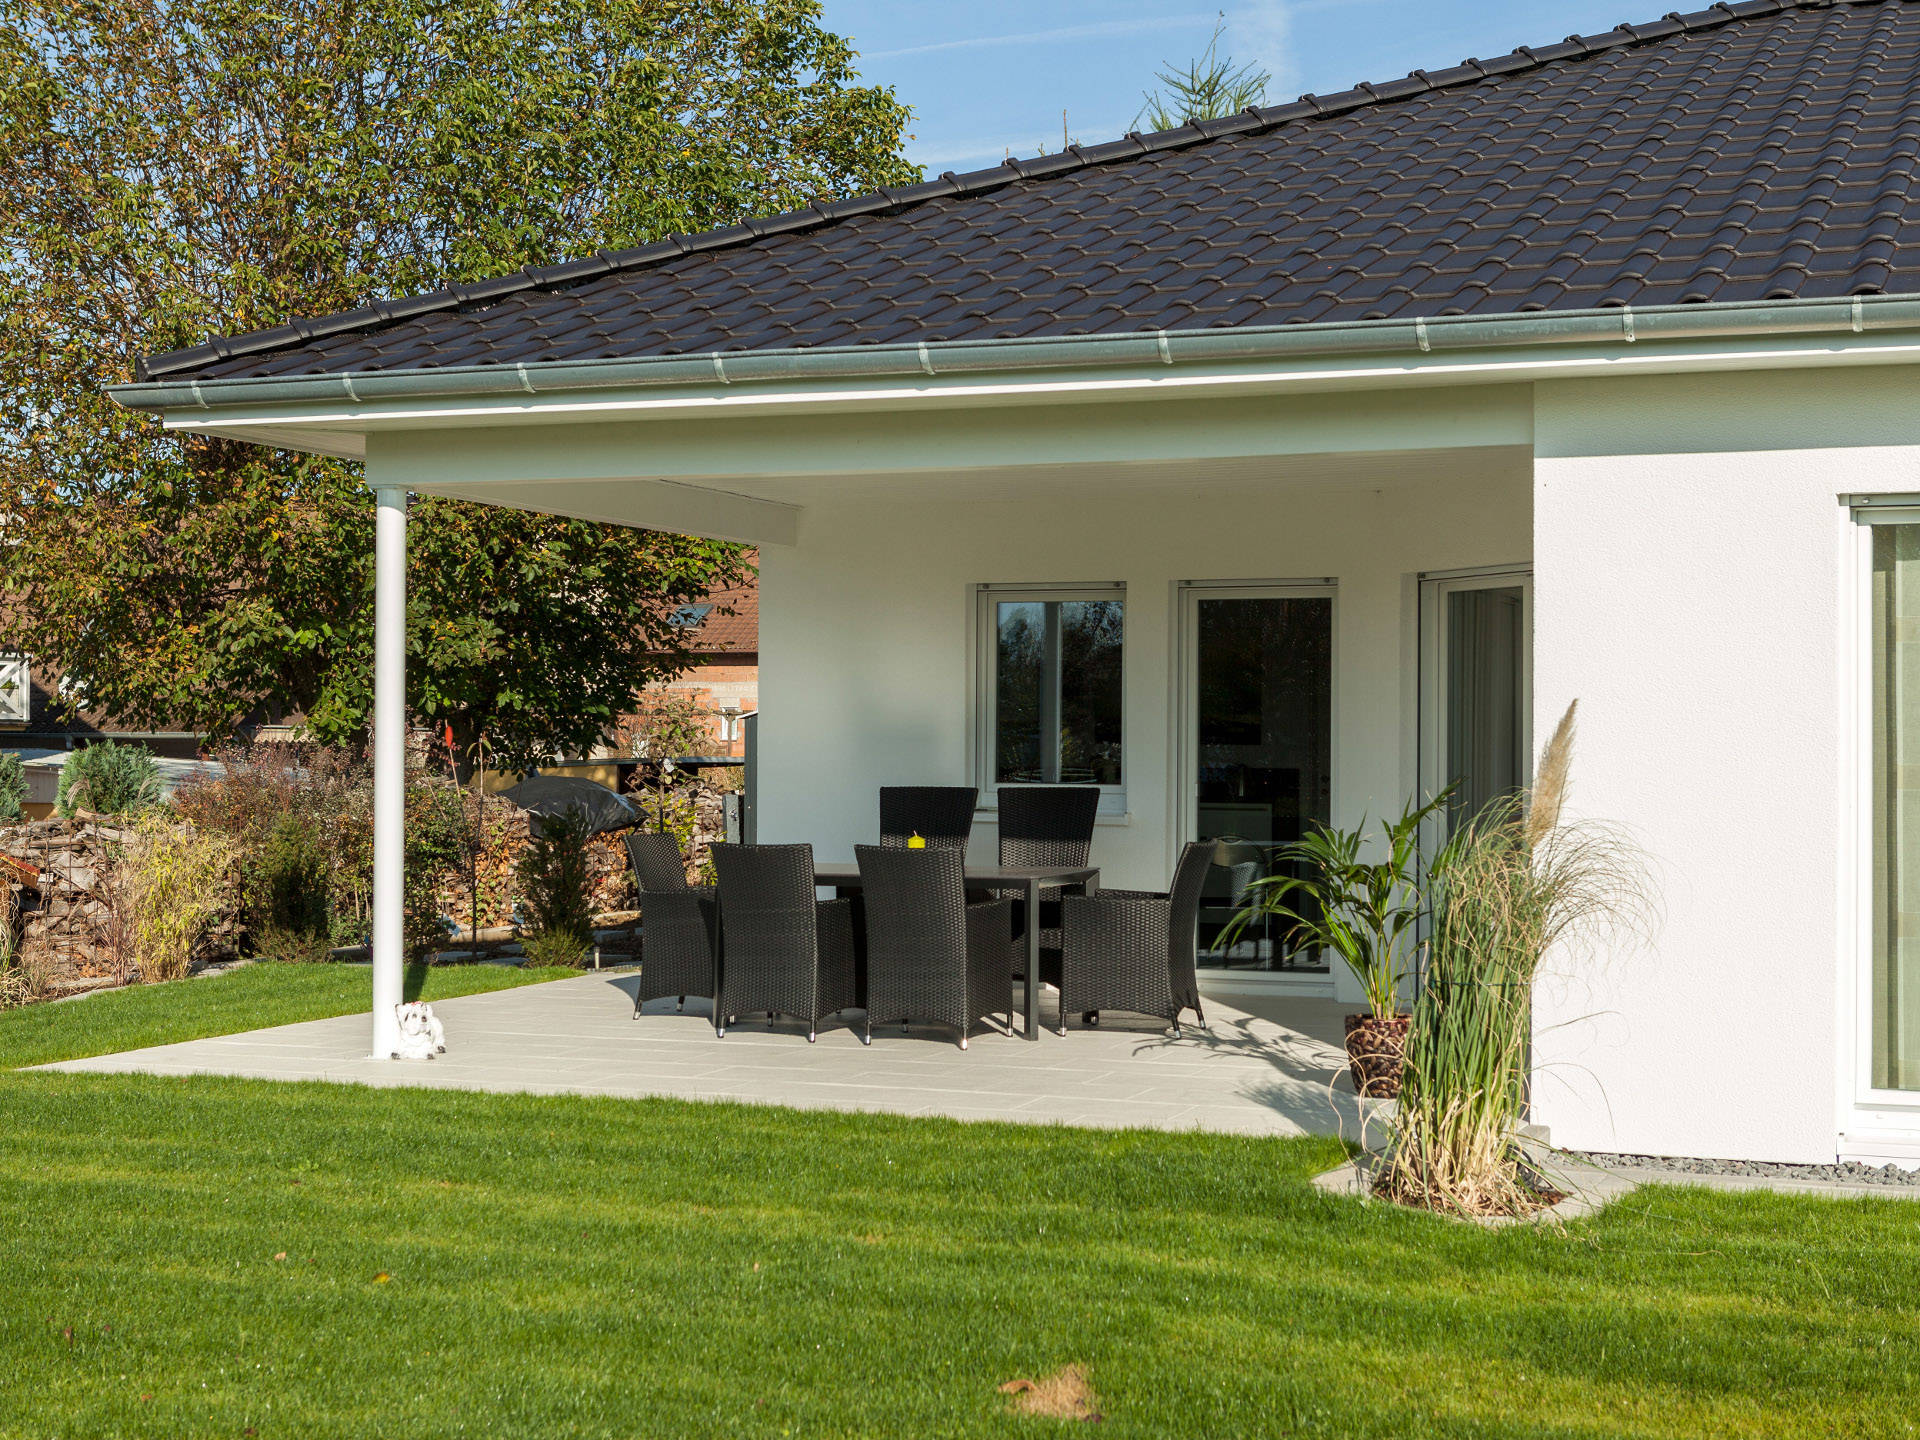 bungalow 130 zimmermann haus. Black Bedroom Furniture Sets. Home Design Ideas